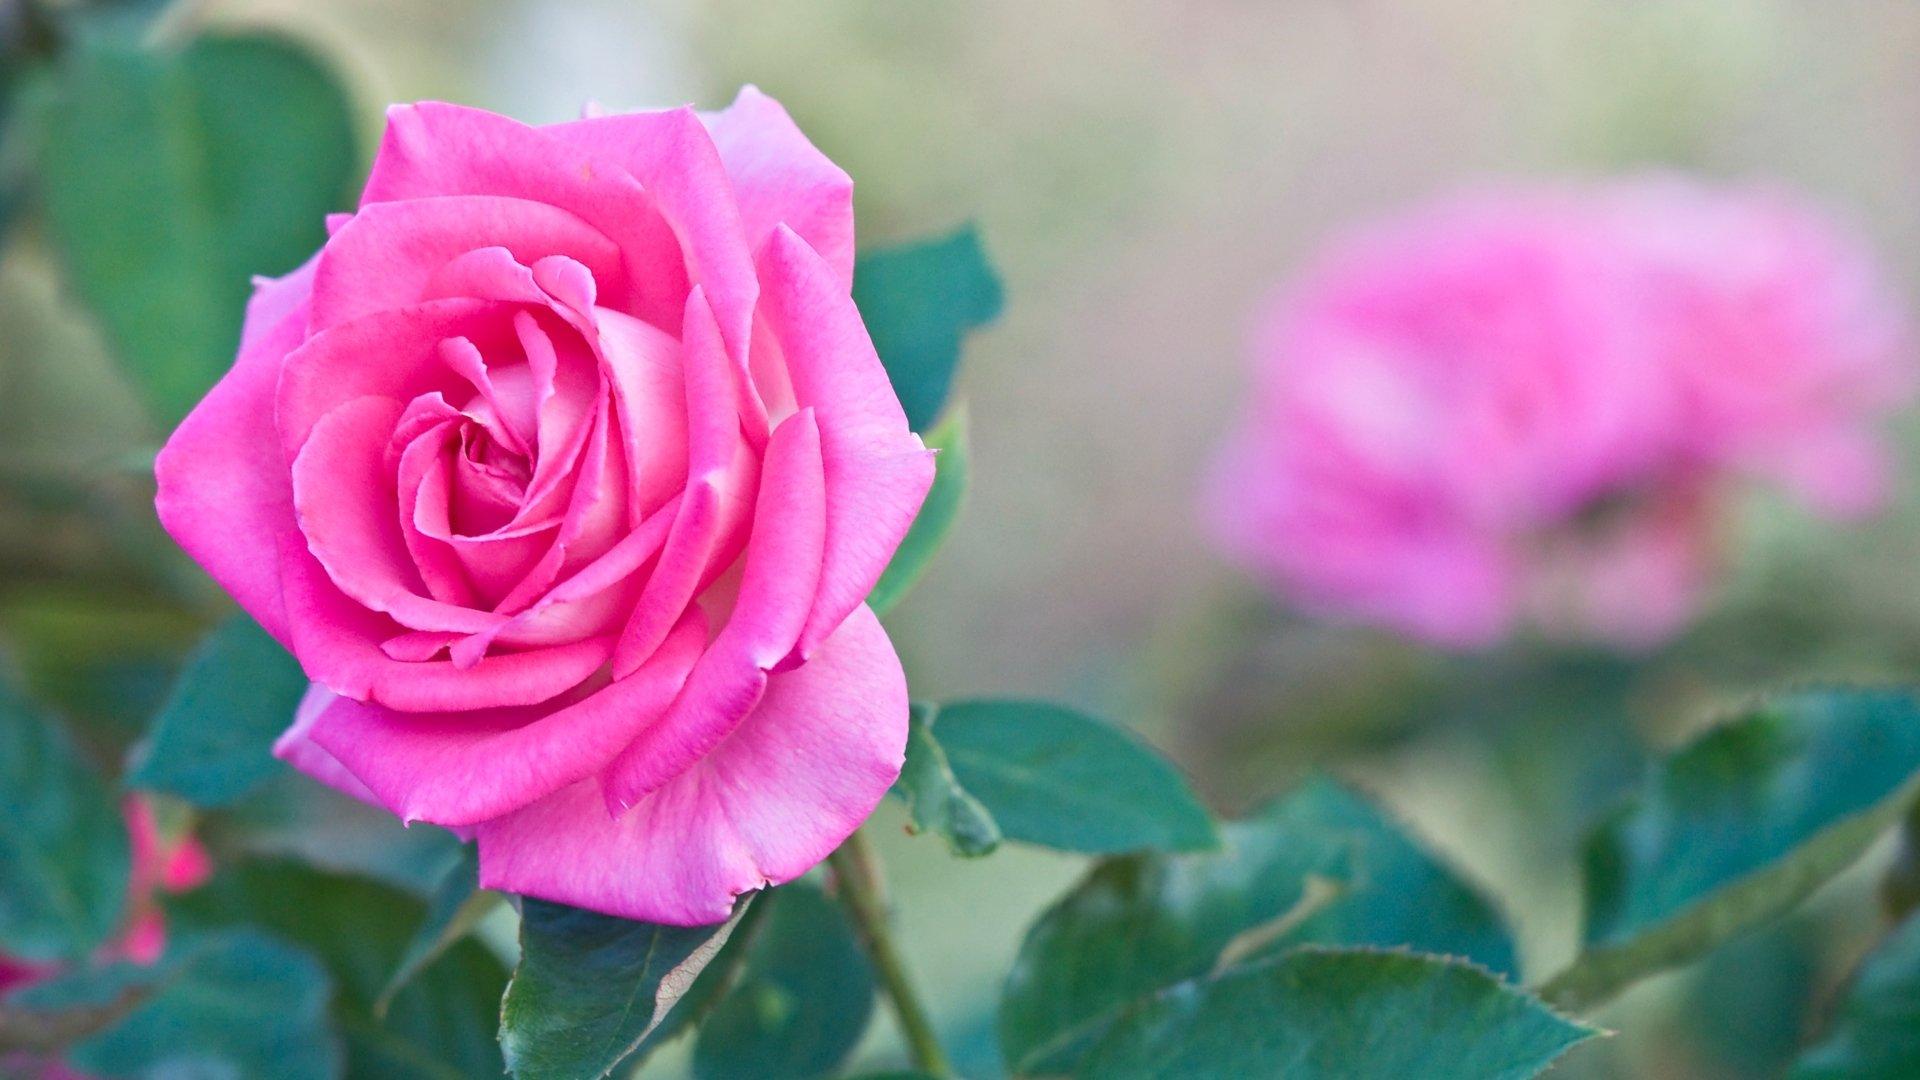 Earth - Rose  Flower Nature Pink Flower Spring Pink Rose Wallpaper